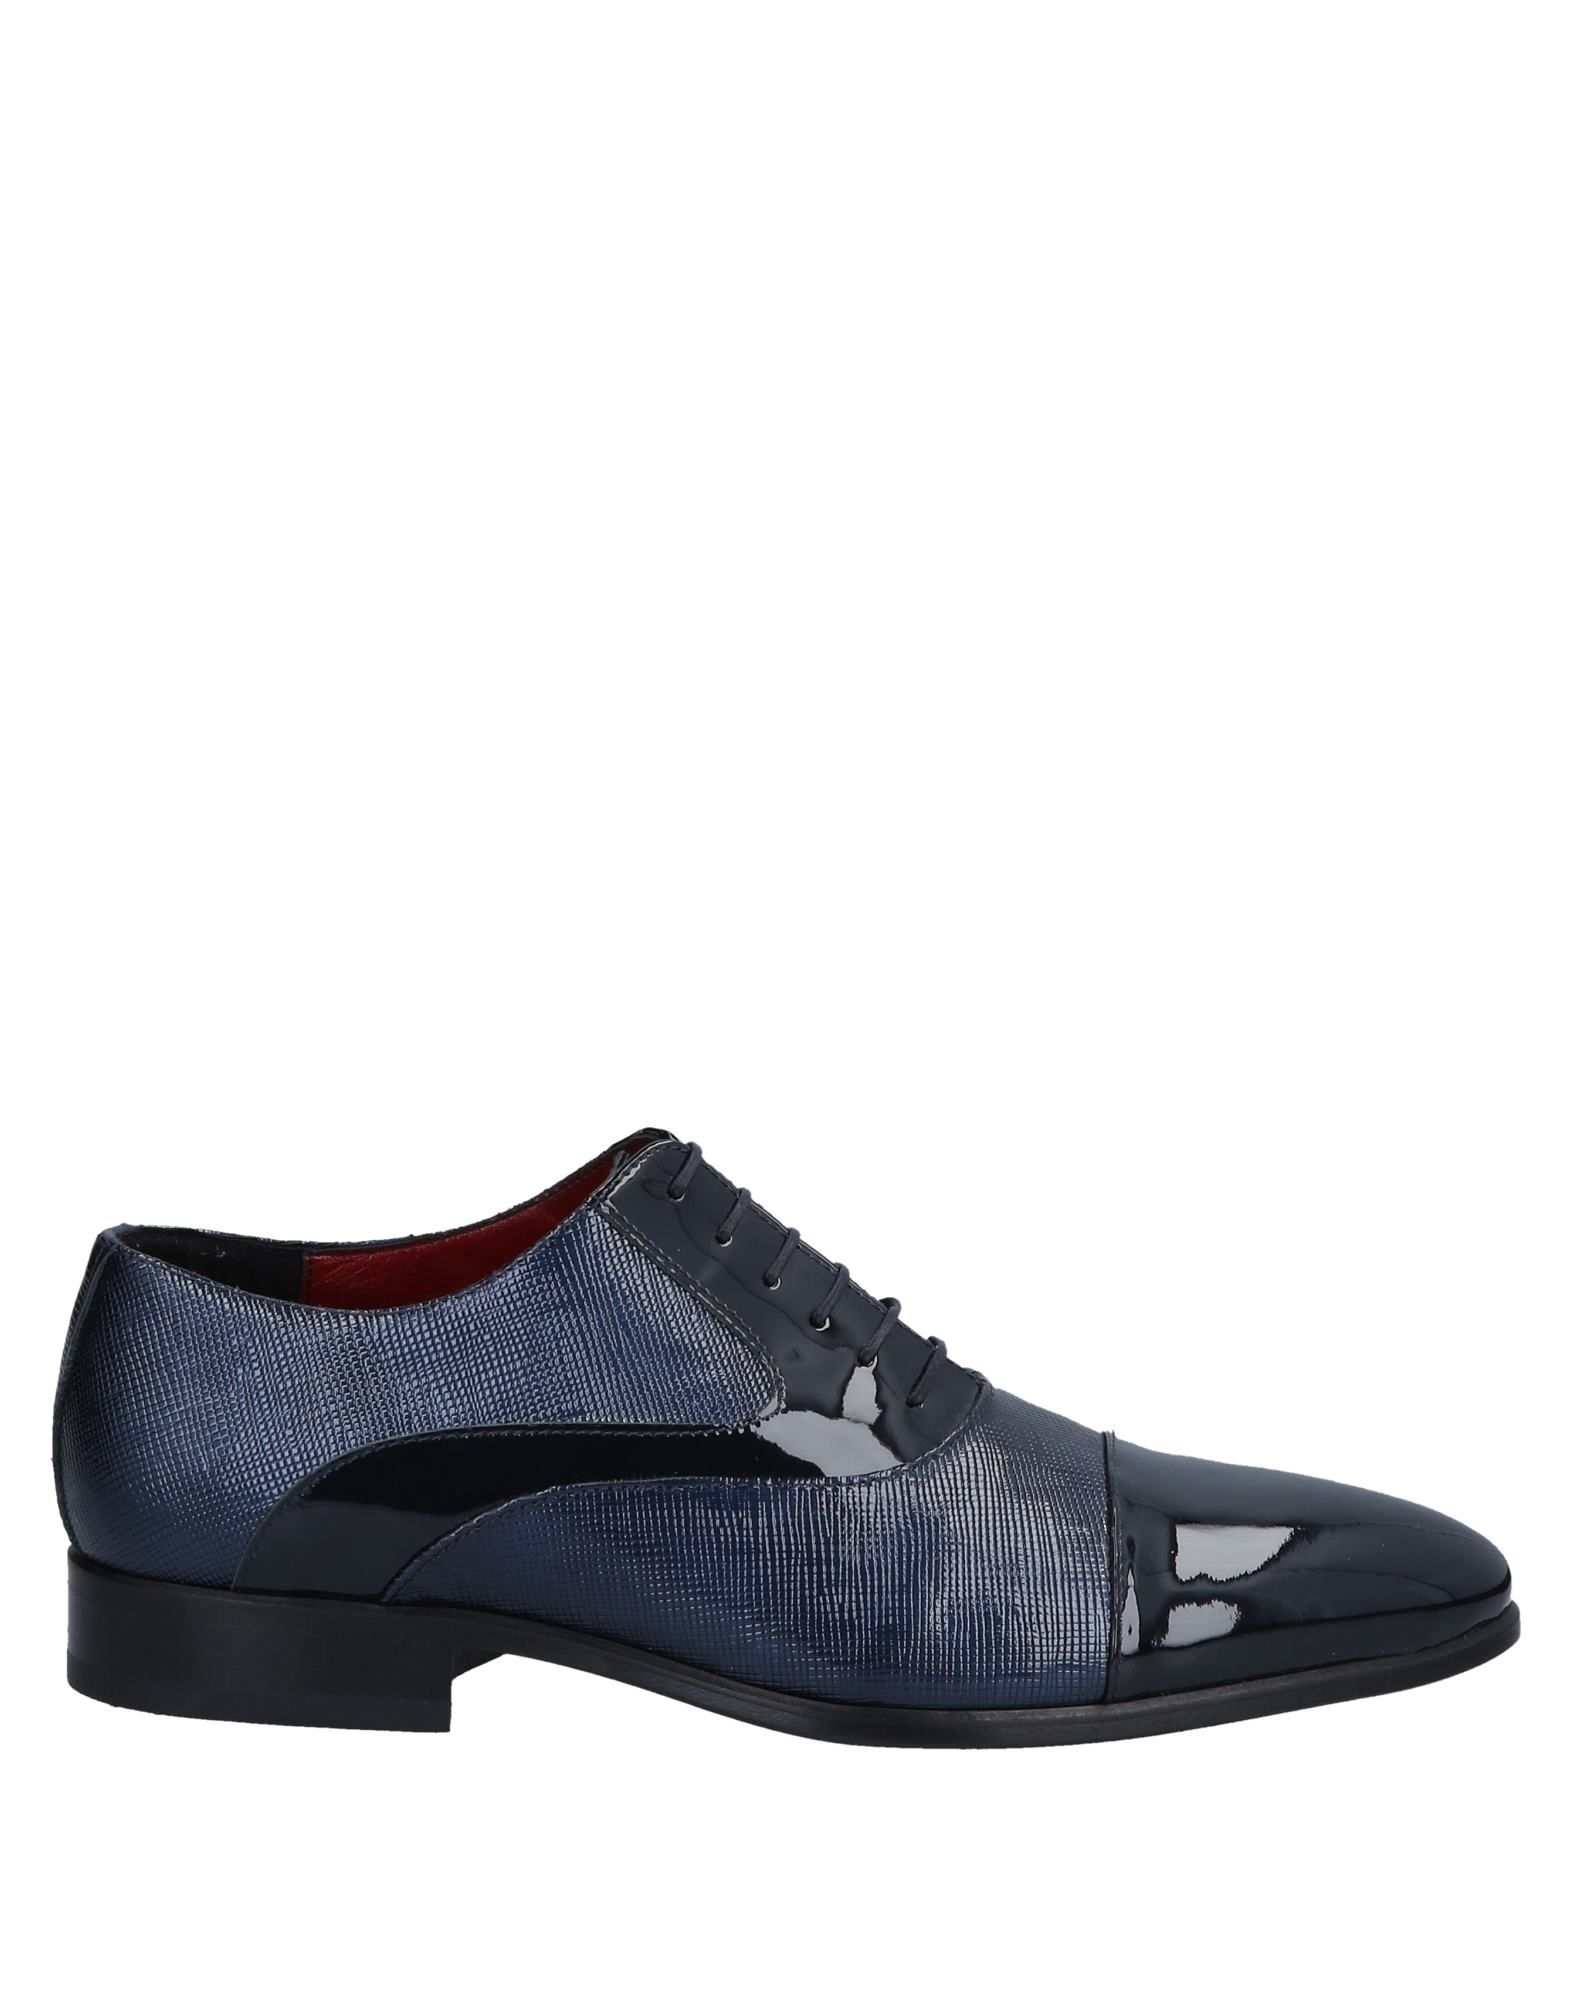 CALZOLERIA MARINI dal 1945 Обувь на шнурках dal dosso® перчатки